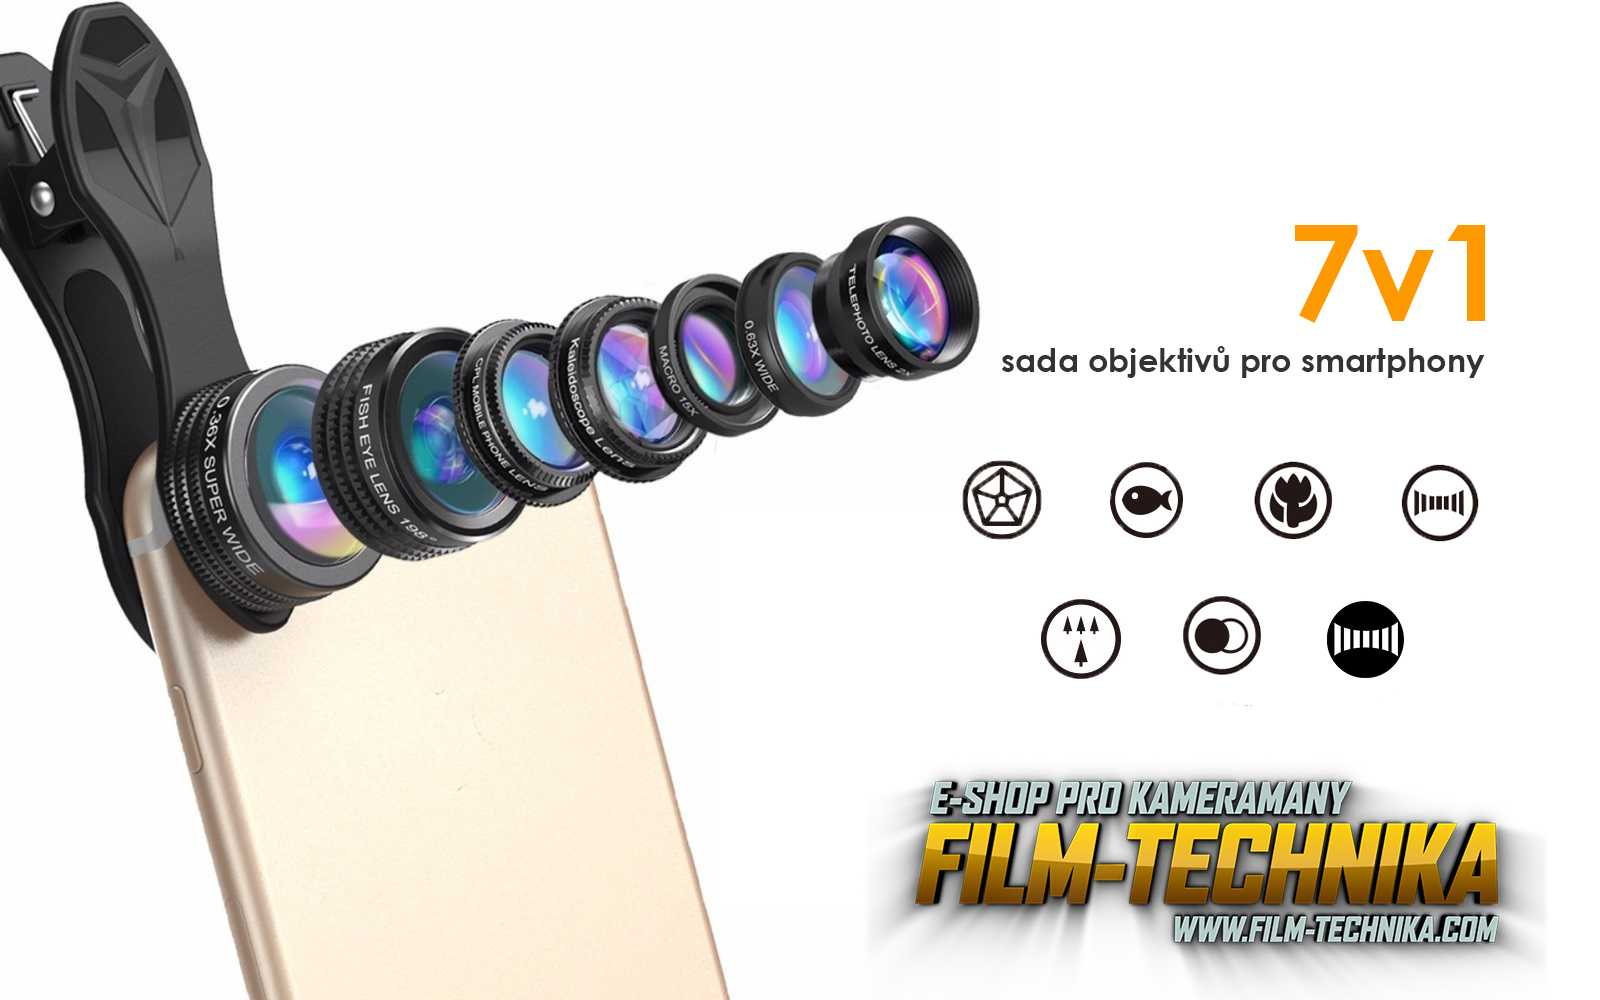 film-technika-ulanzi-7-v-1-sada-objektivu-pro-smartphony-01a